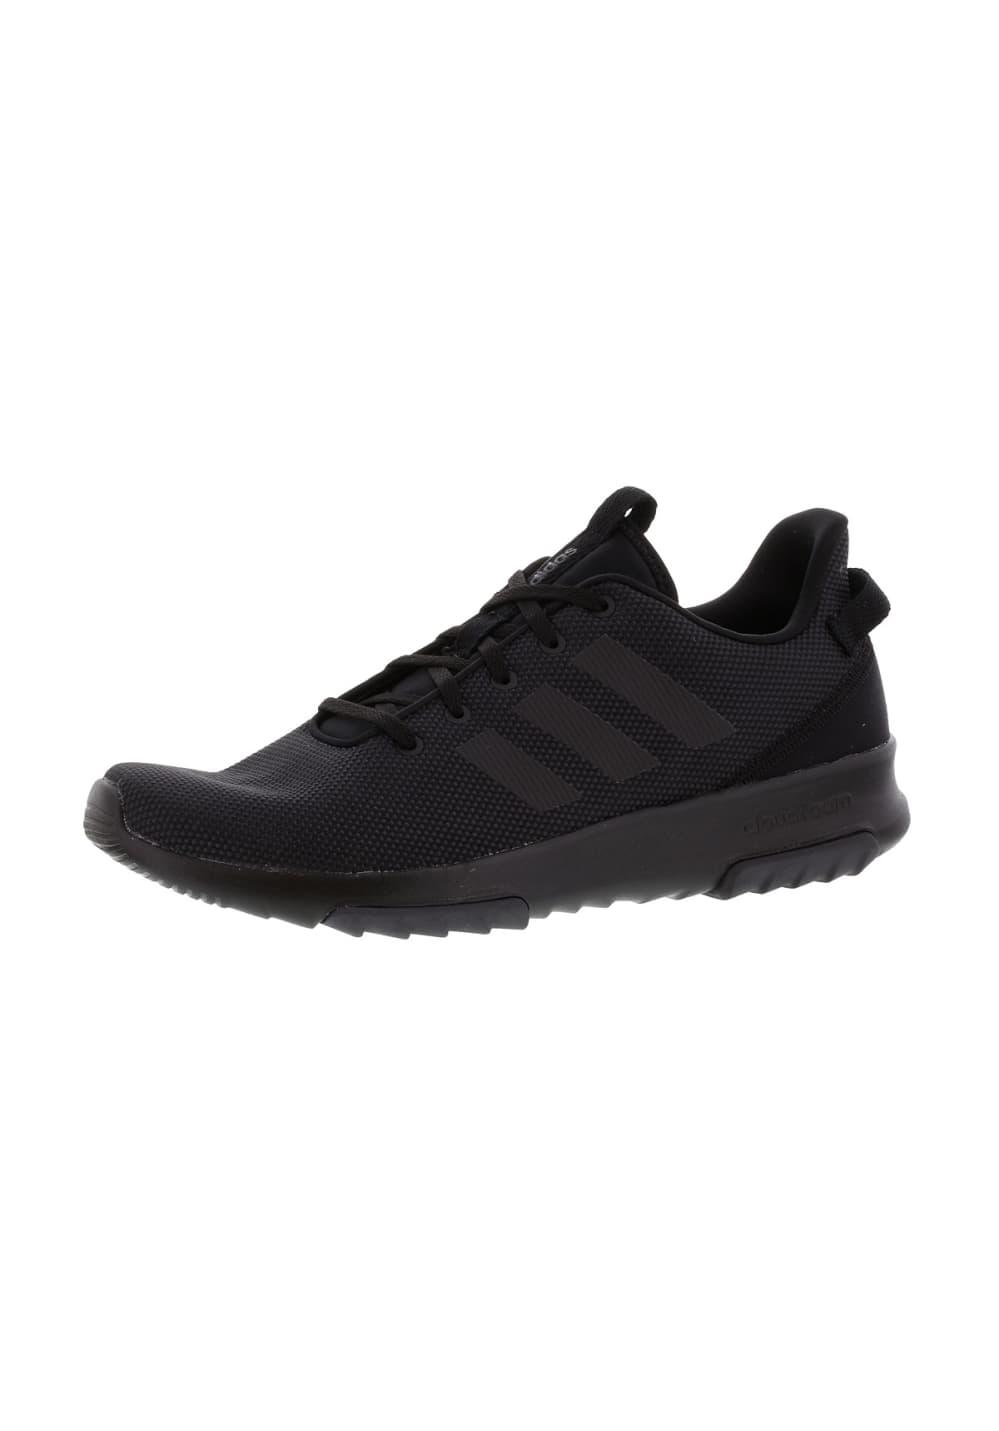 Adidas Chaussure femme Cloudfoam Racer neo adidas